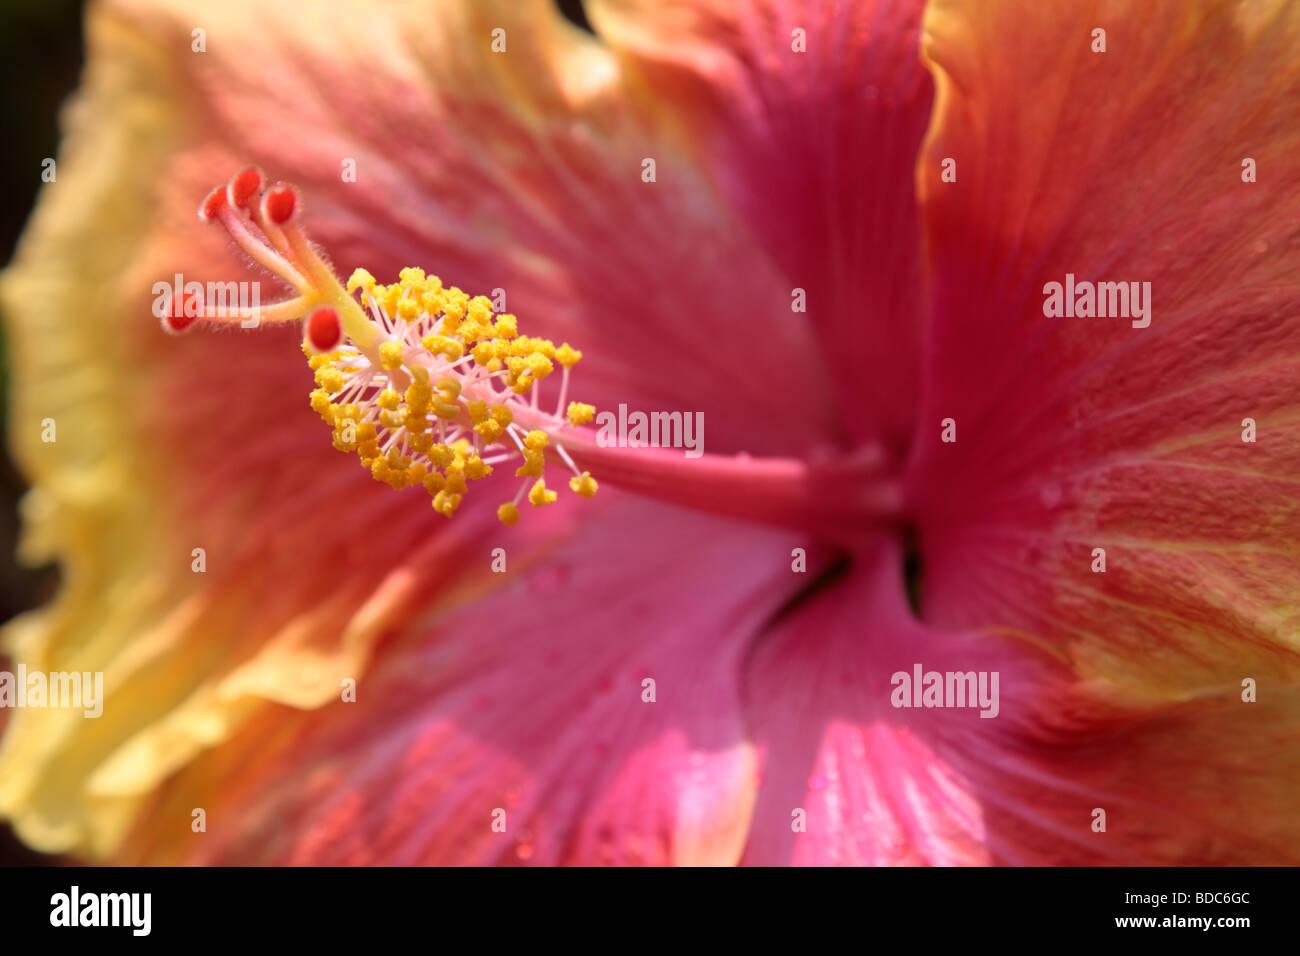 hibiskusbl te malvaceae hautnah stockfoto bild 25469484 alamy. Black Bedroom Furniture Sets. Home Design Ideas